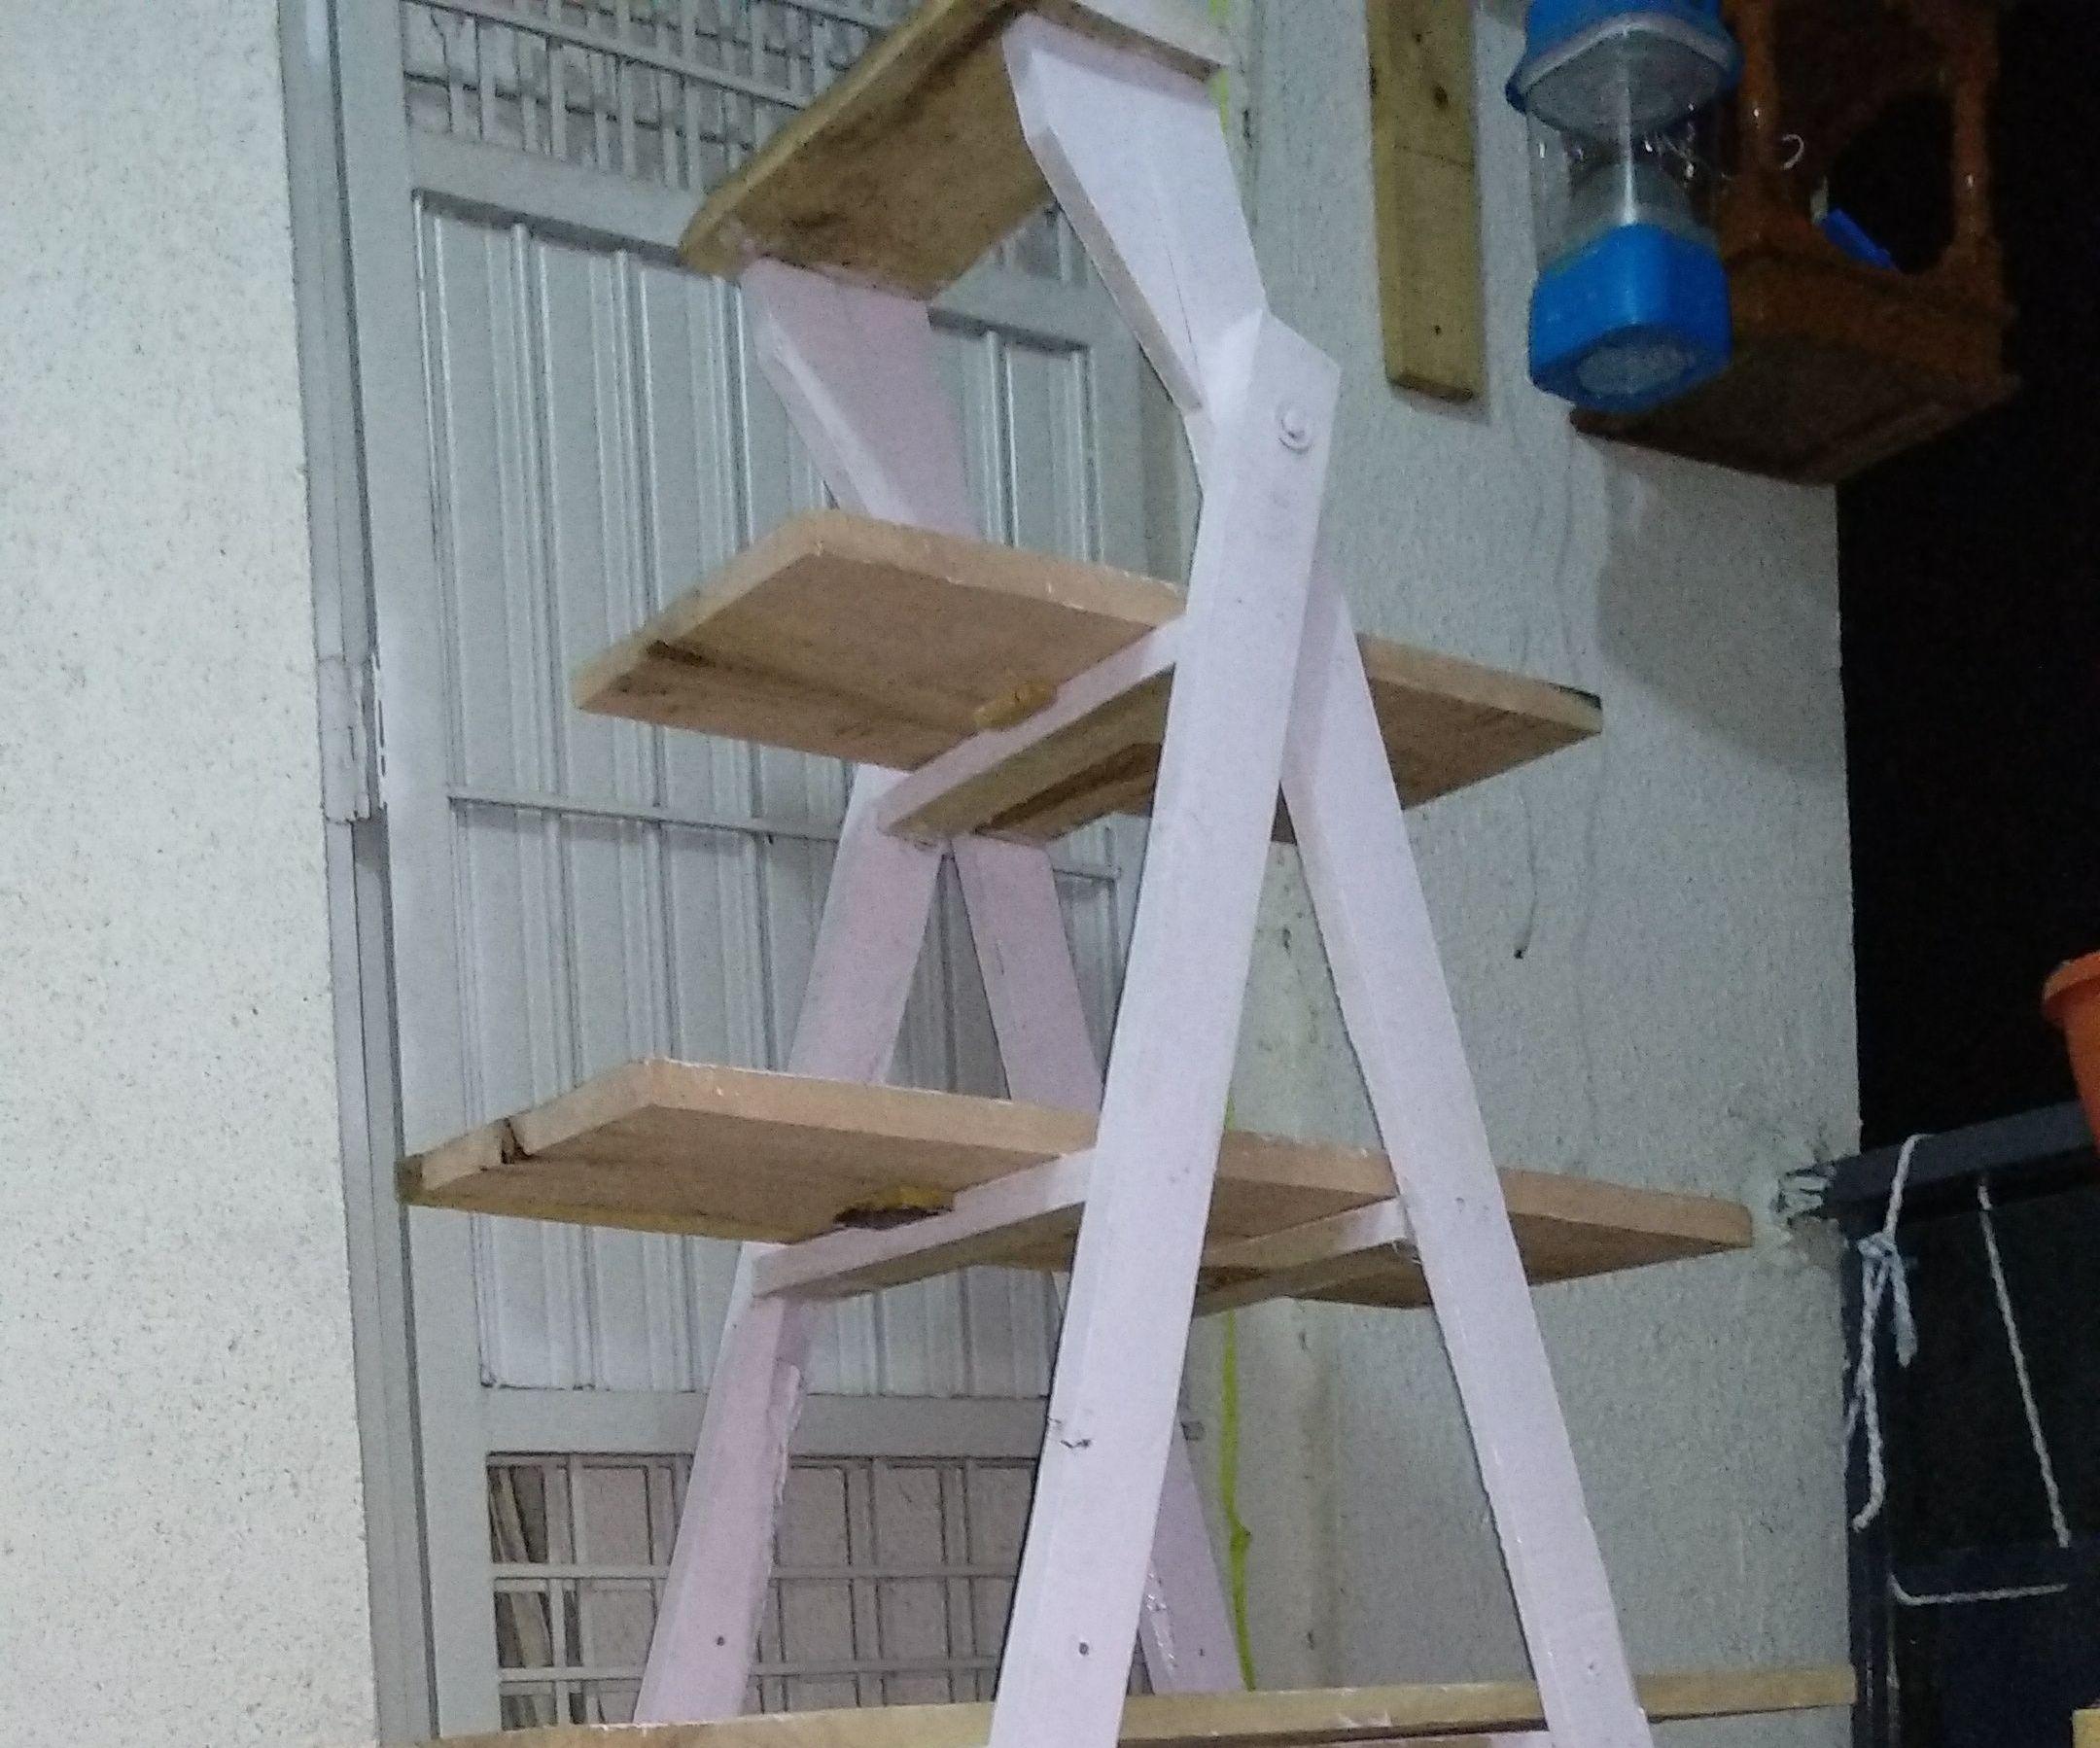 DIY Ladder Shelf Using Inexpensive Materials